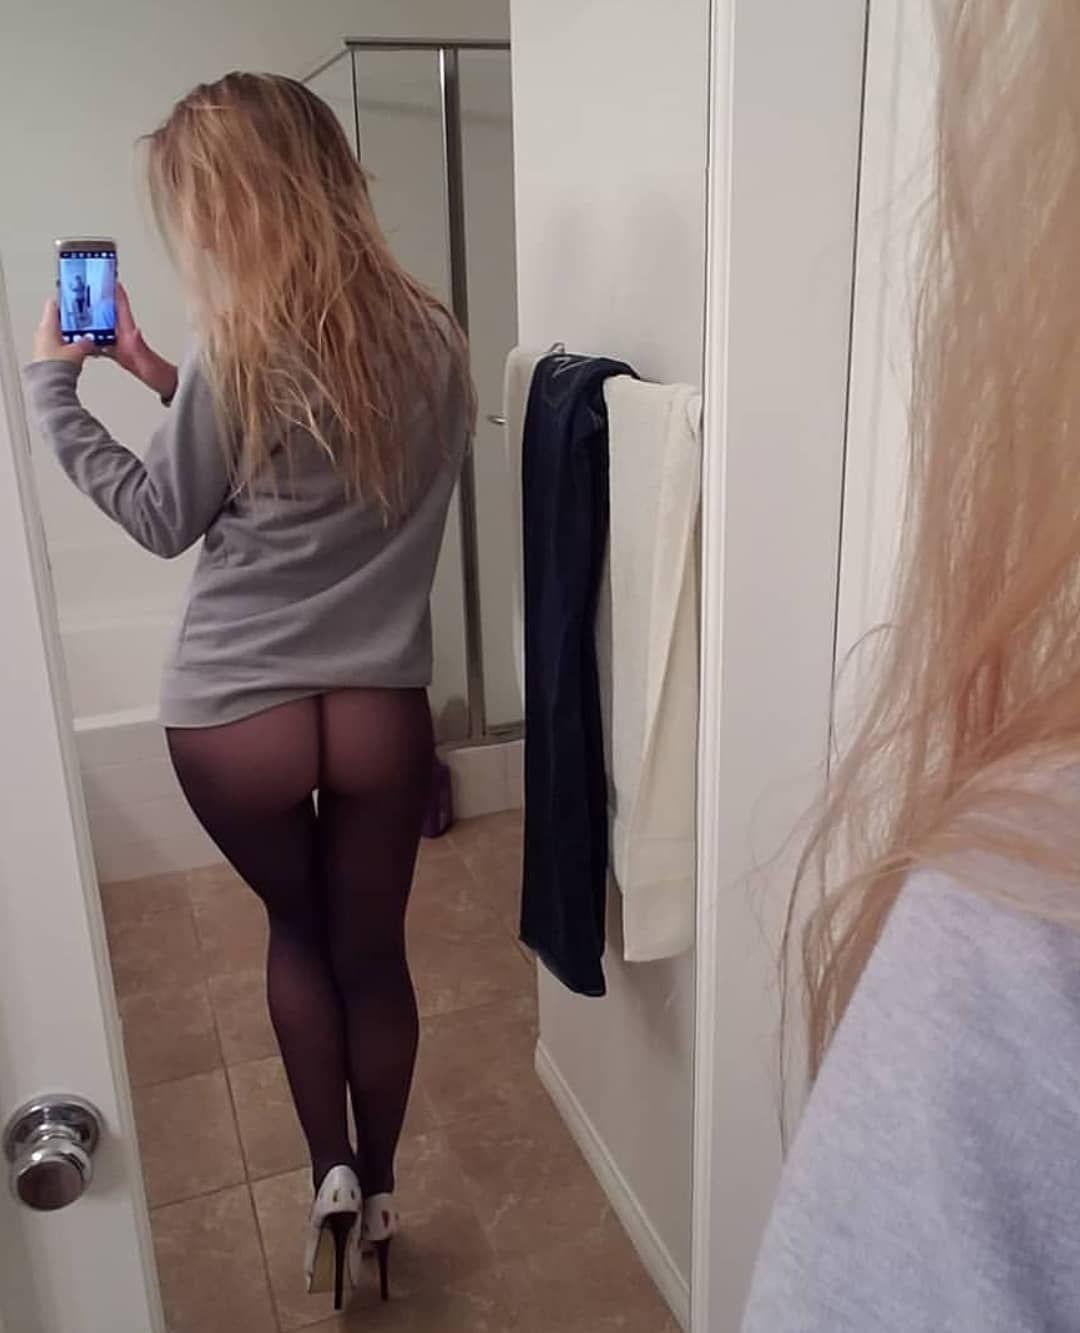 Pin on Sexy Mirror Selfies